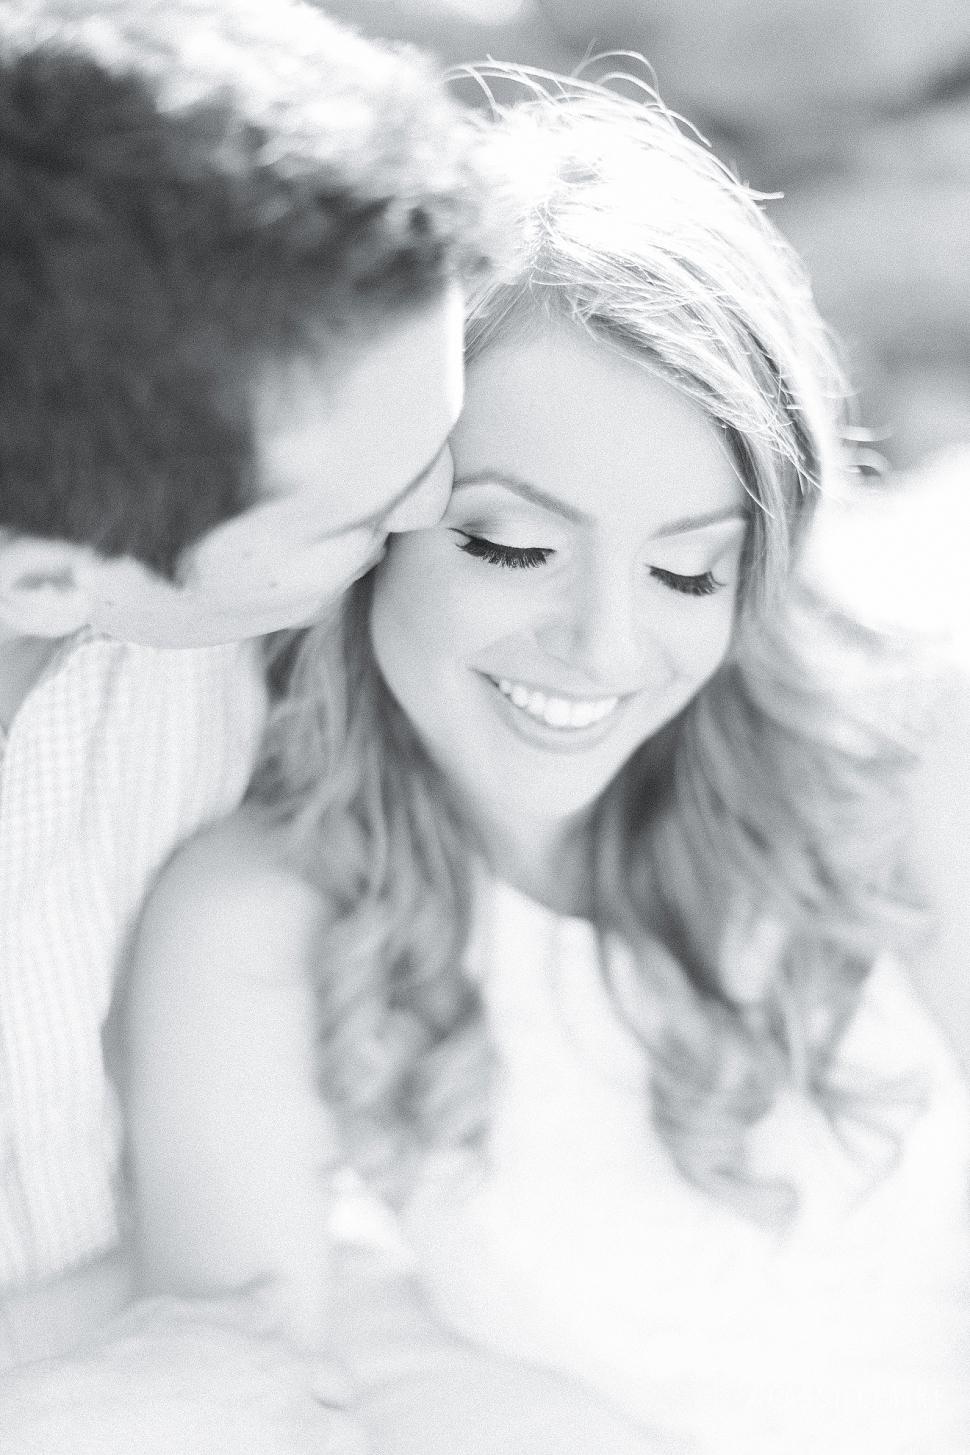 DUMBO-Engagement-Photos_14.jpg